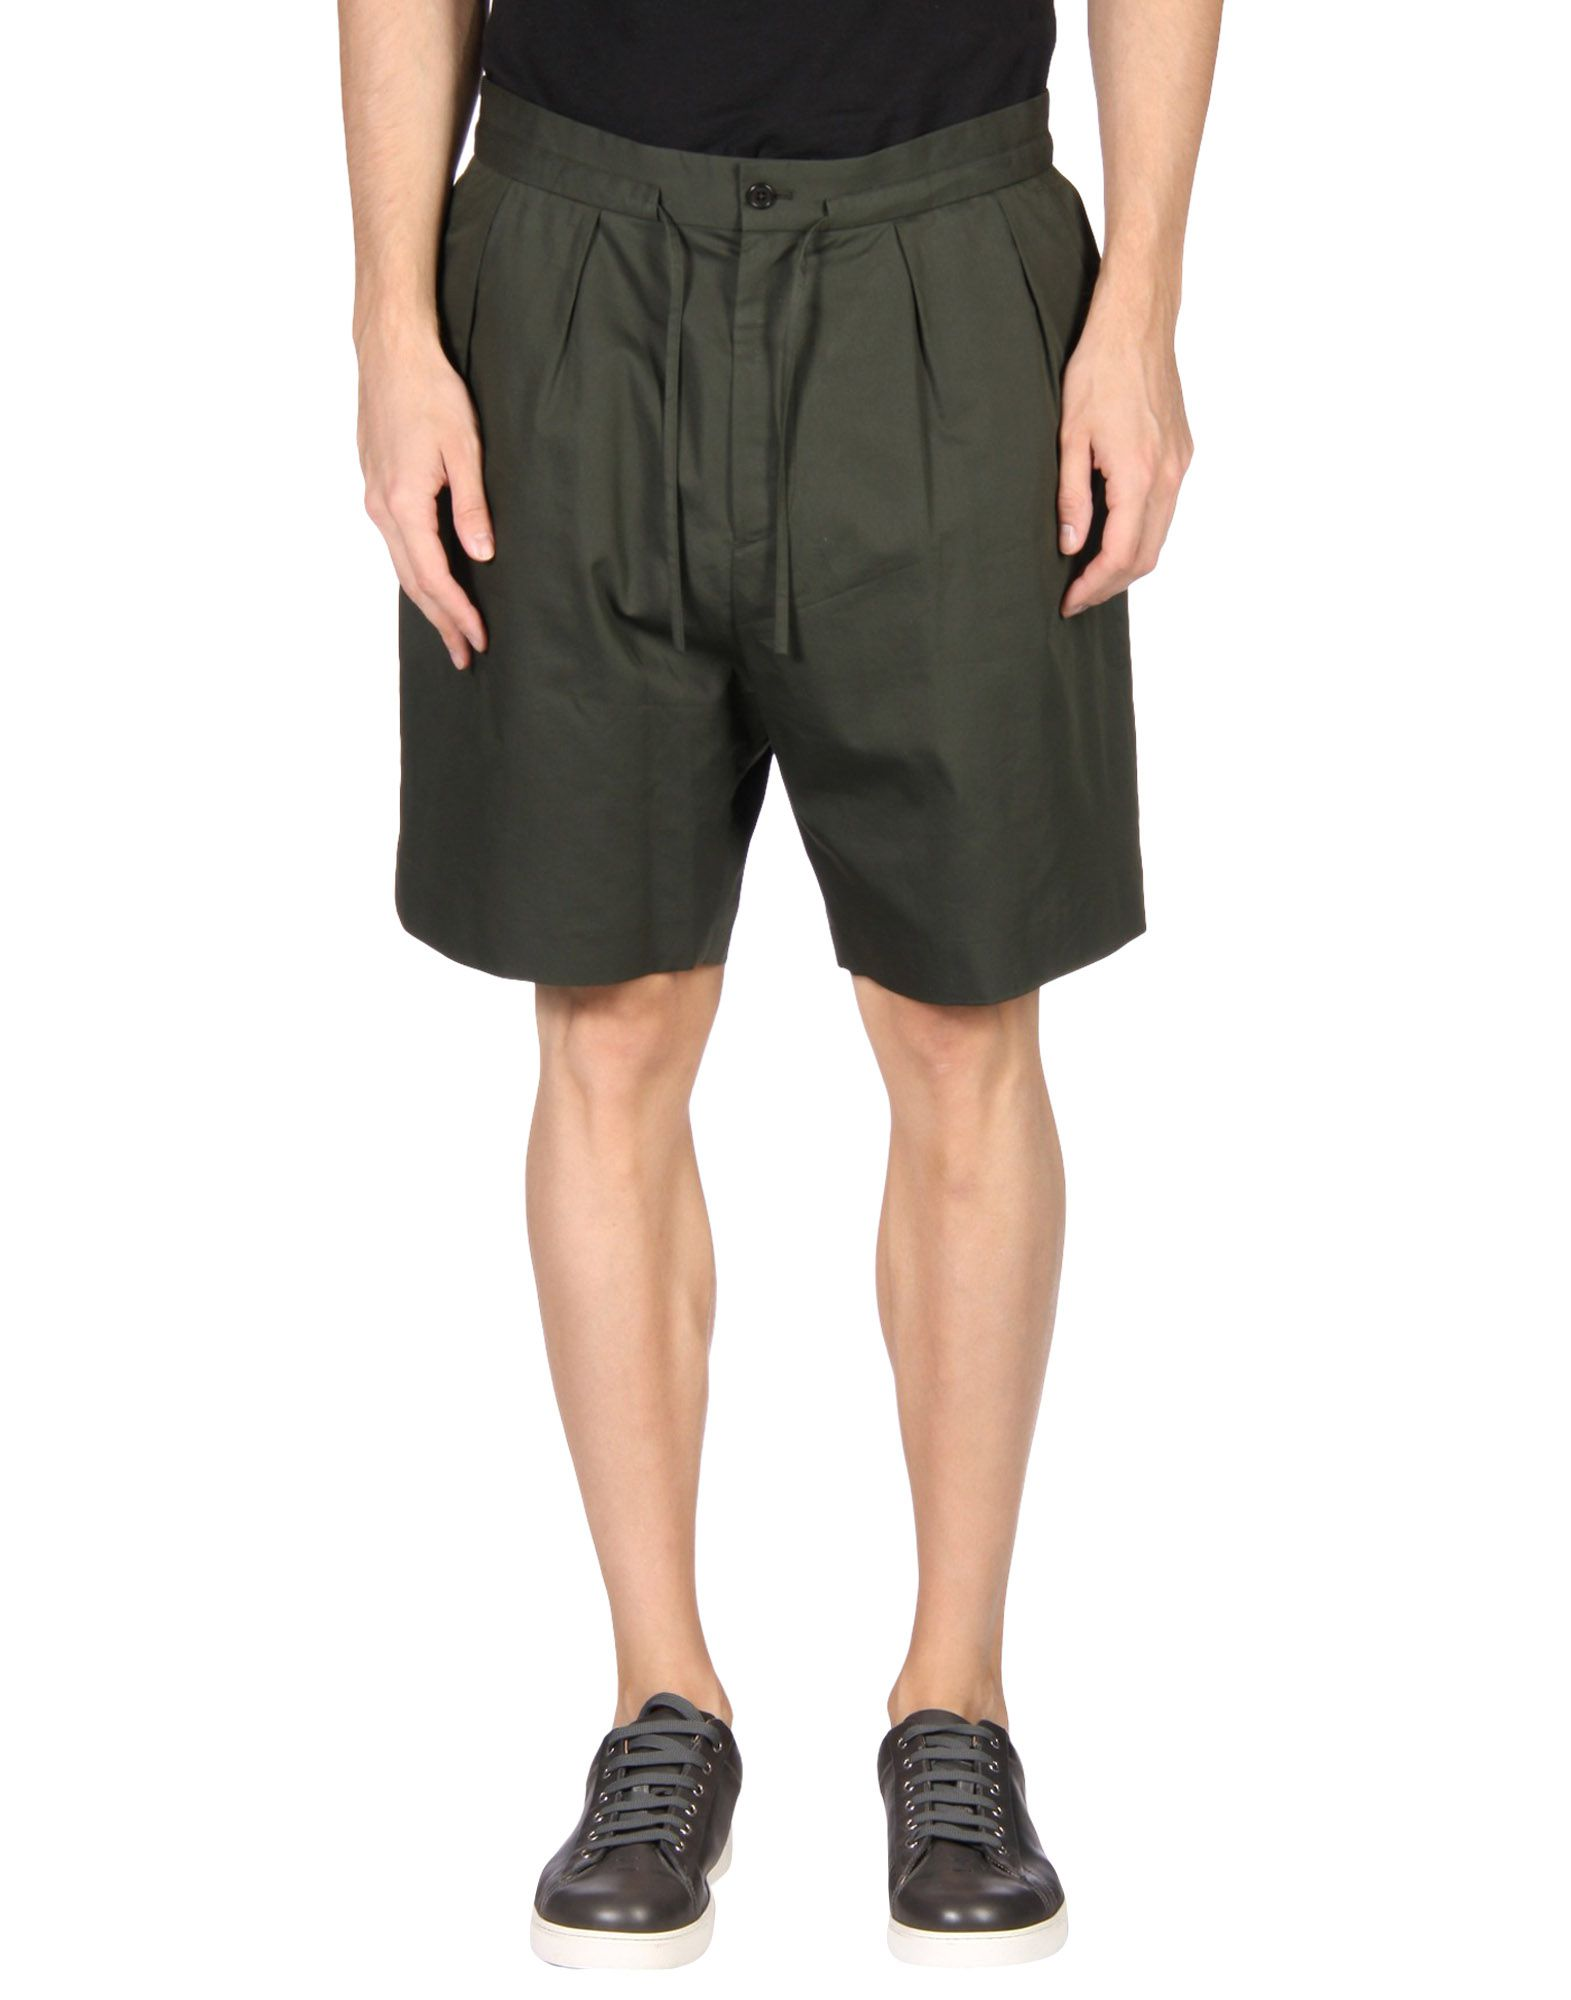 Shorts Ports 1961 Uomo - Acquista online su